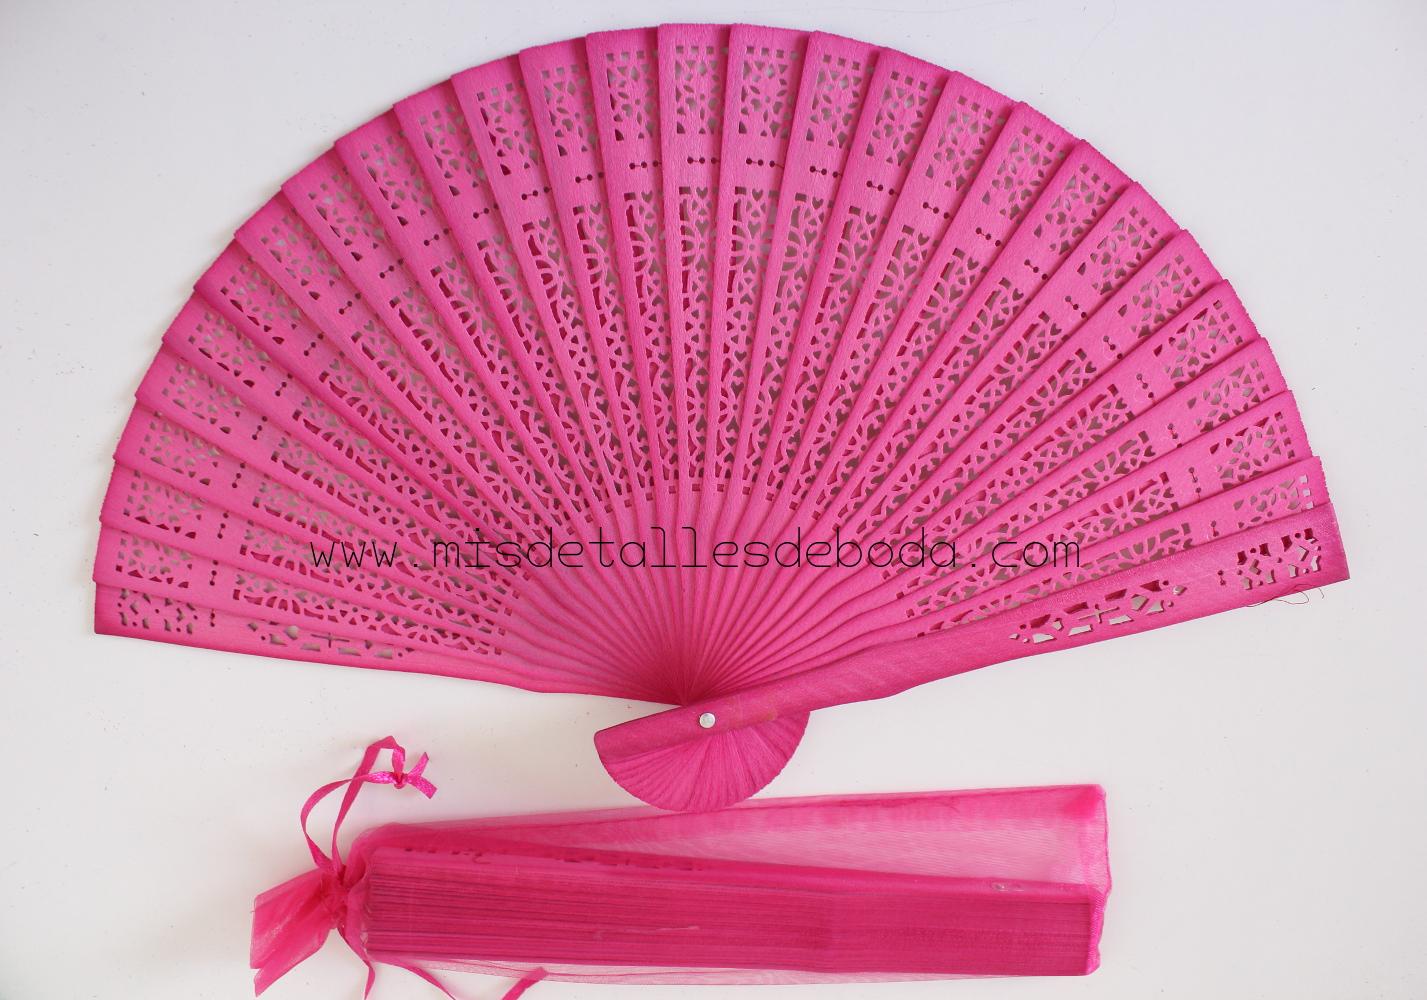 abanico-sandalo-rosa-regalo-boda